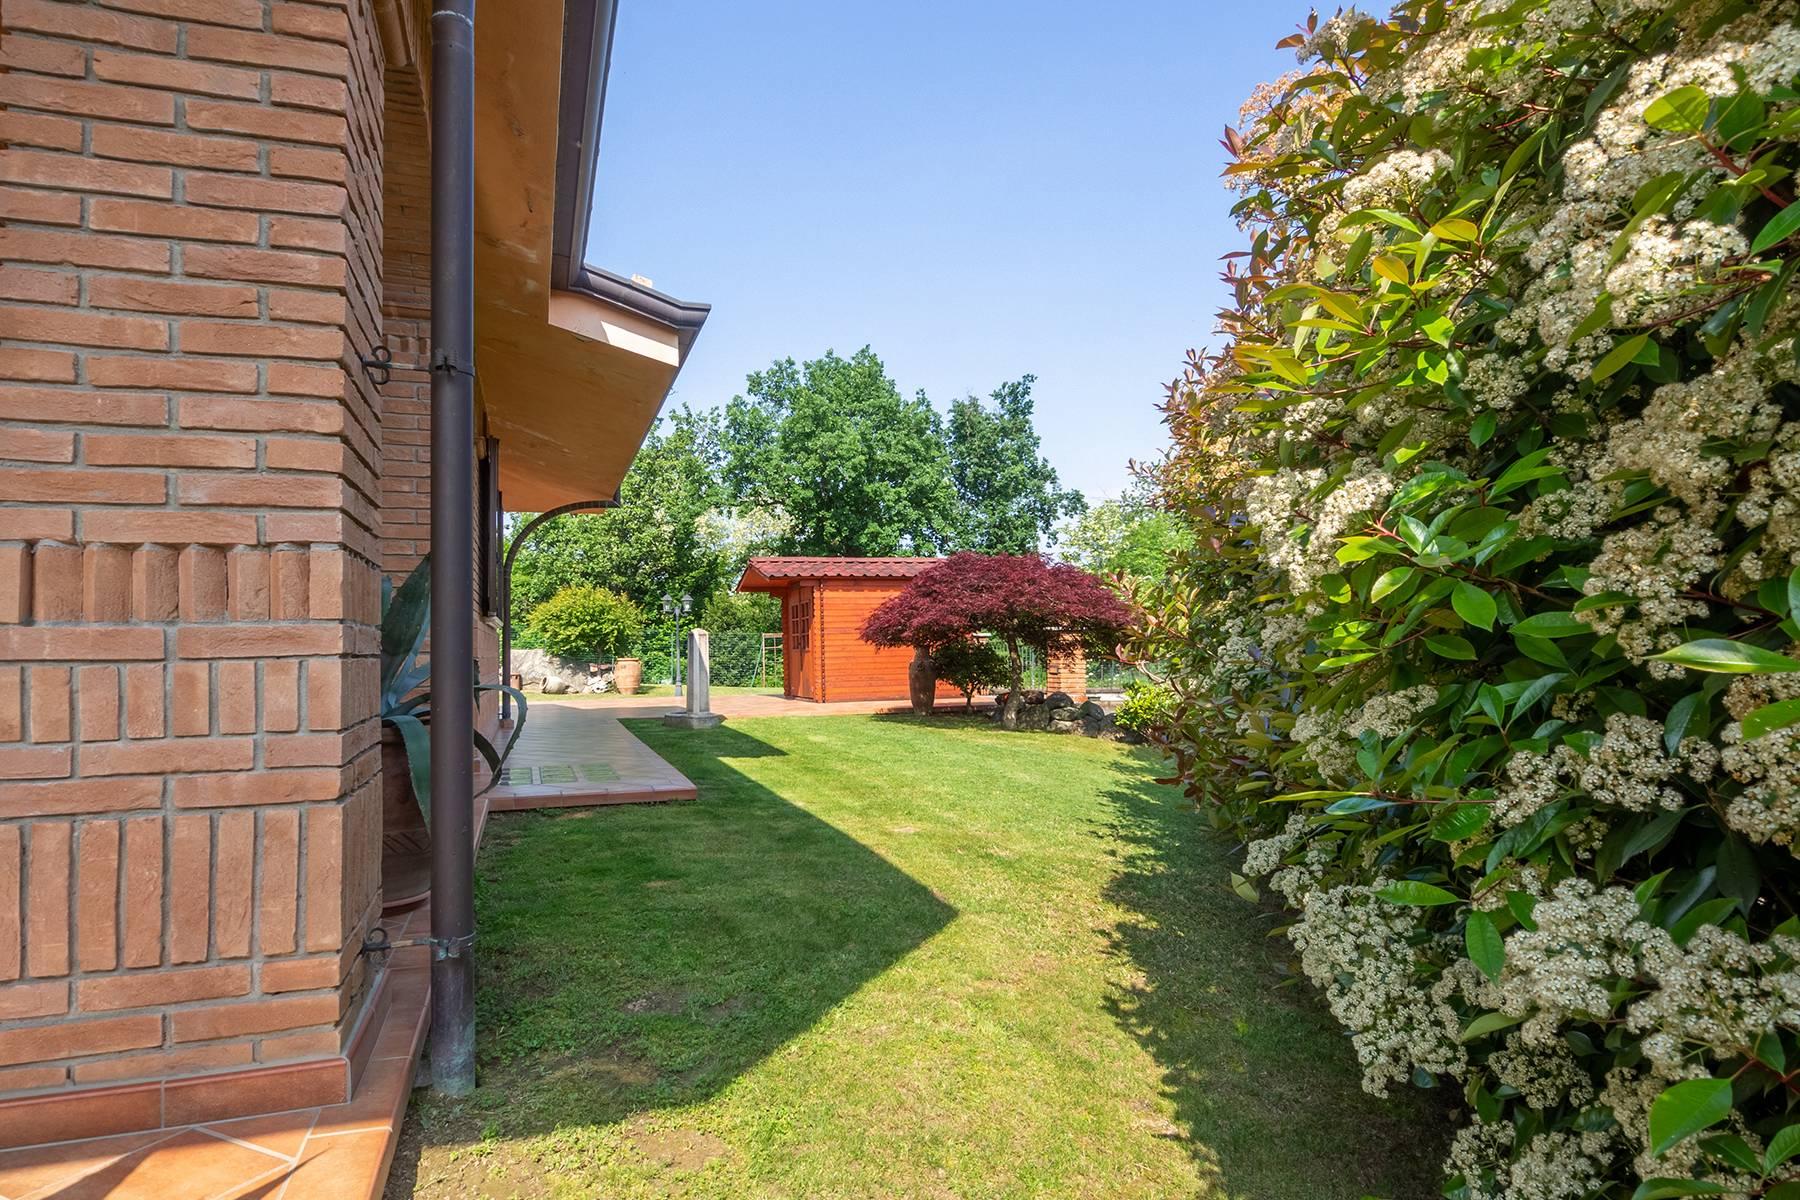 Villa in Vendita a Rosta: 5 locali, 182 mq - Foto 5